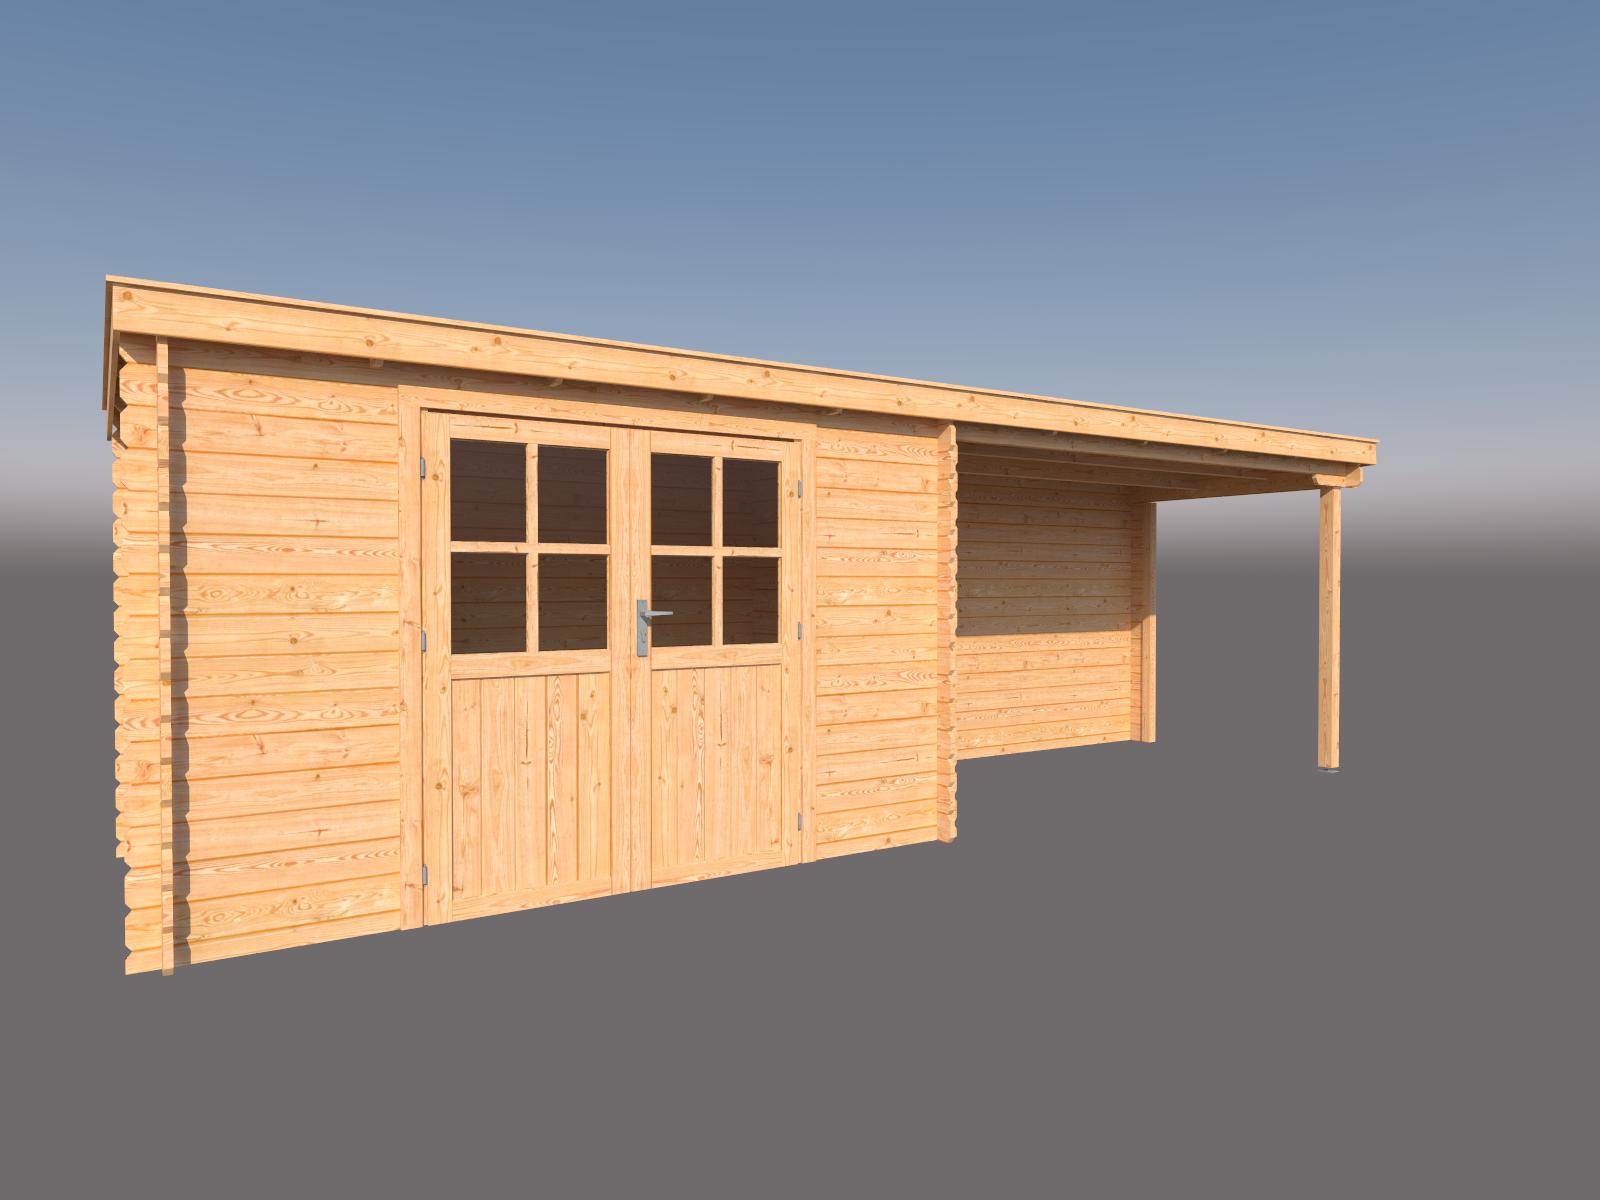 DWF Blokhut met overkapping lessenaar dak 350 x 200 + 350cm